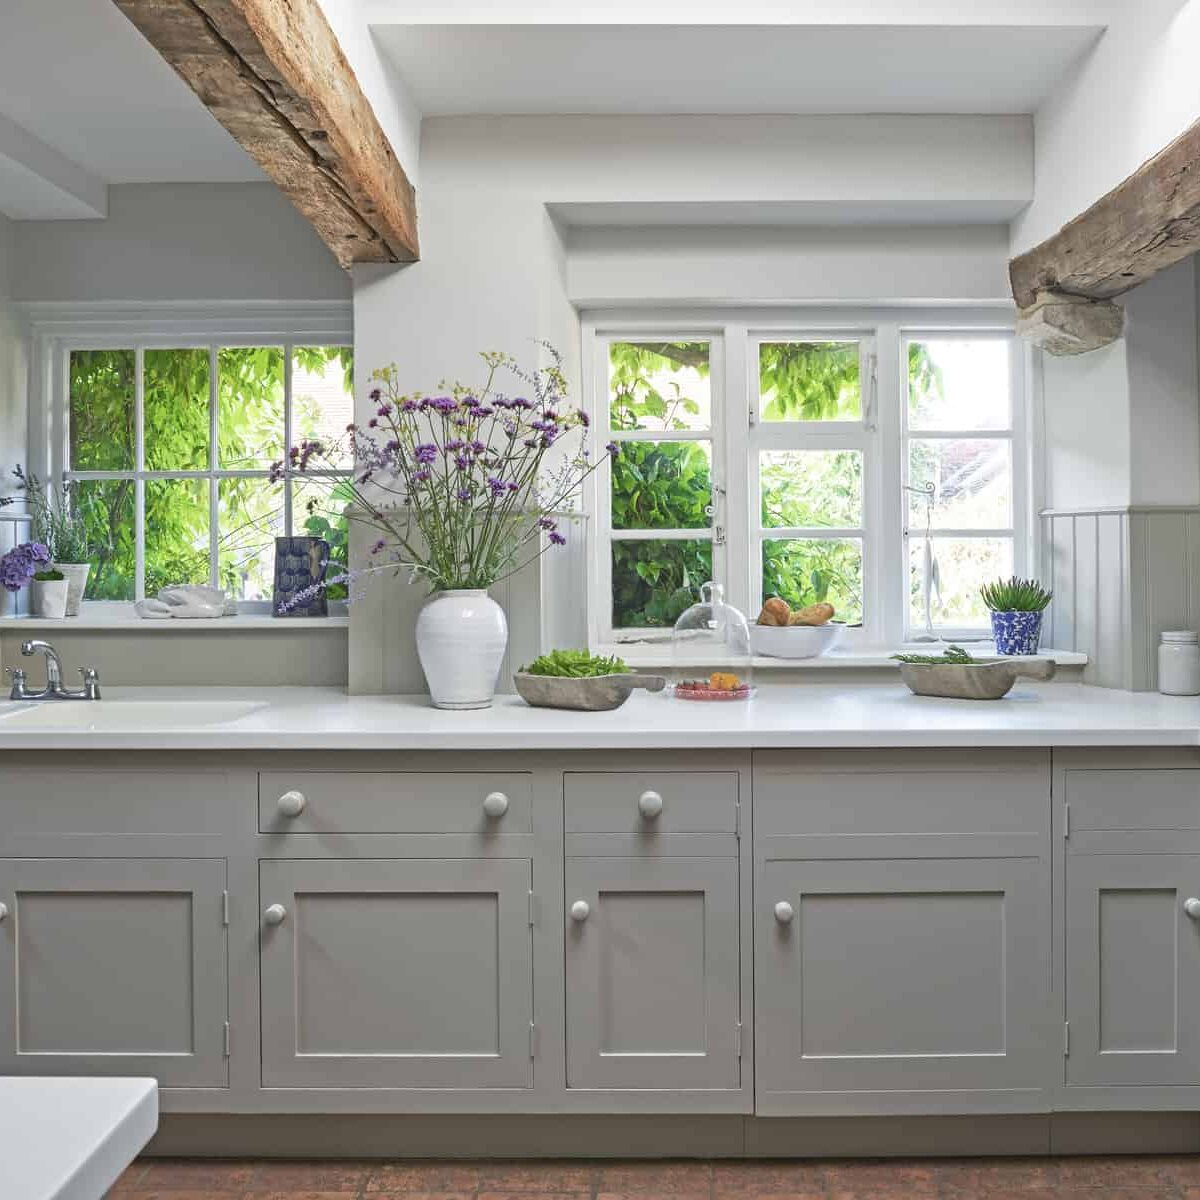 16. Kitchen landscape 5189